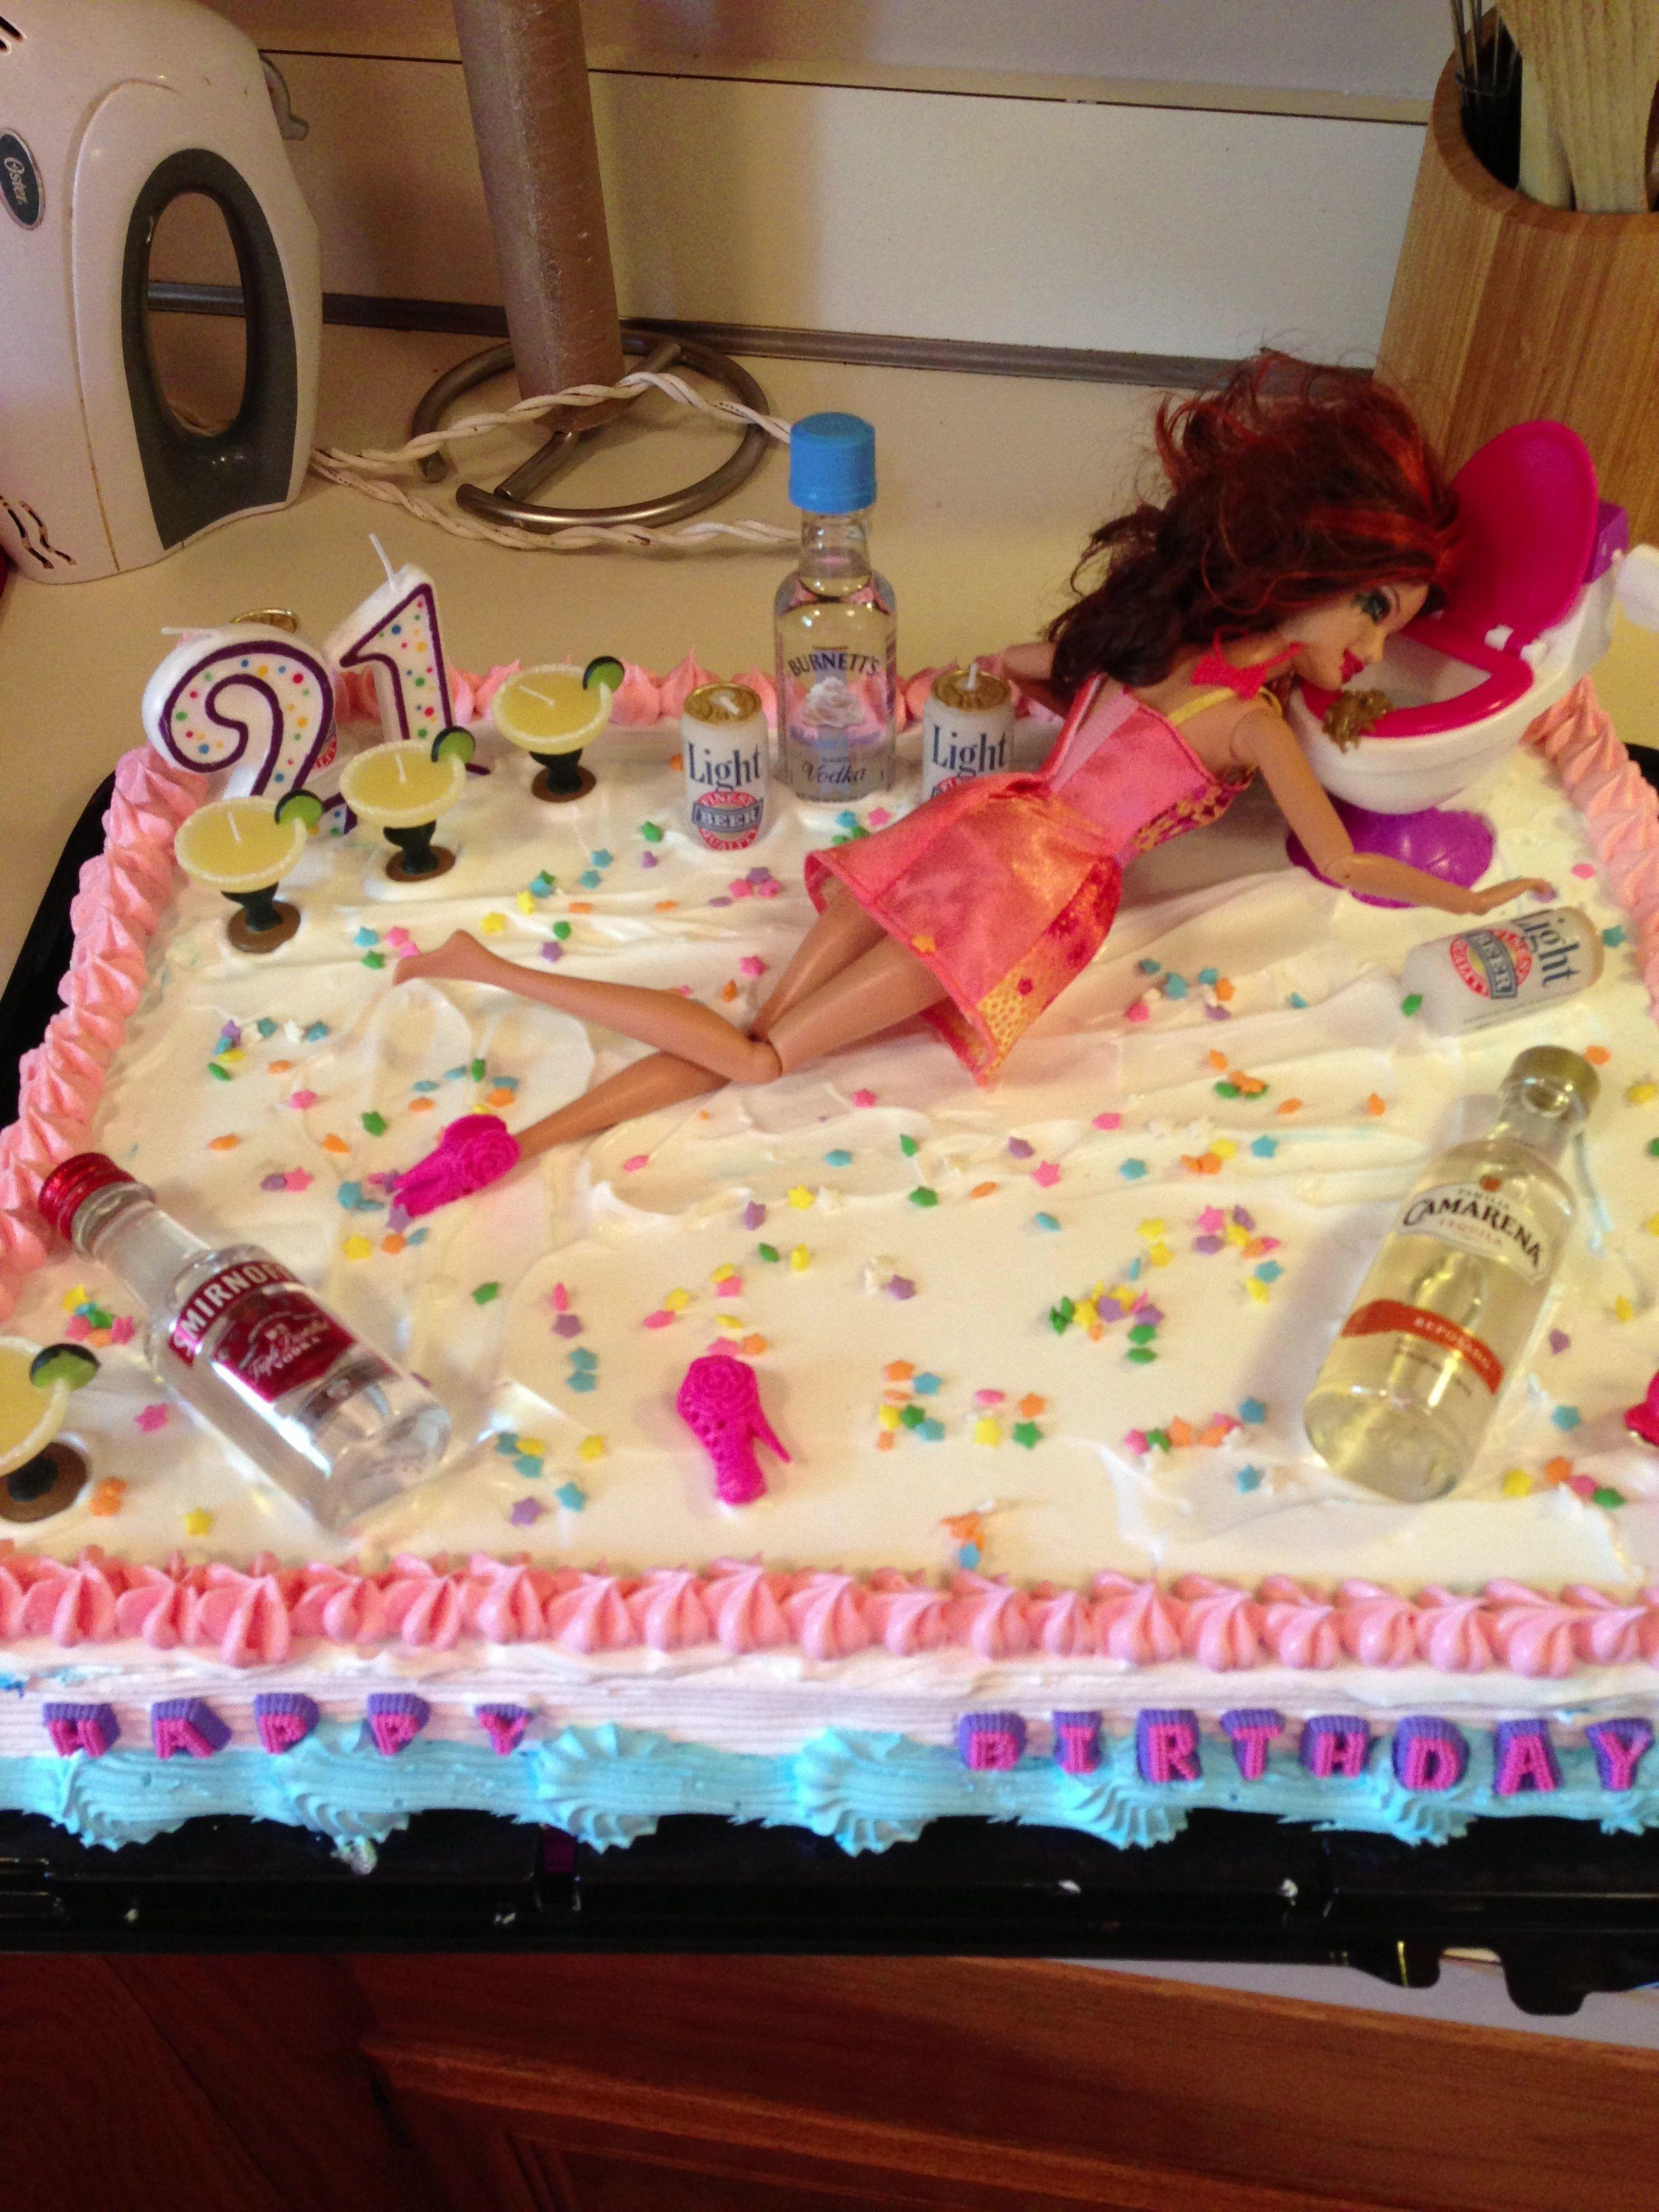 The Best 21st Birthday Cake Ever